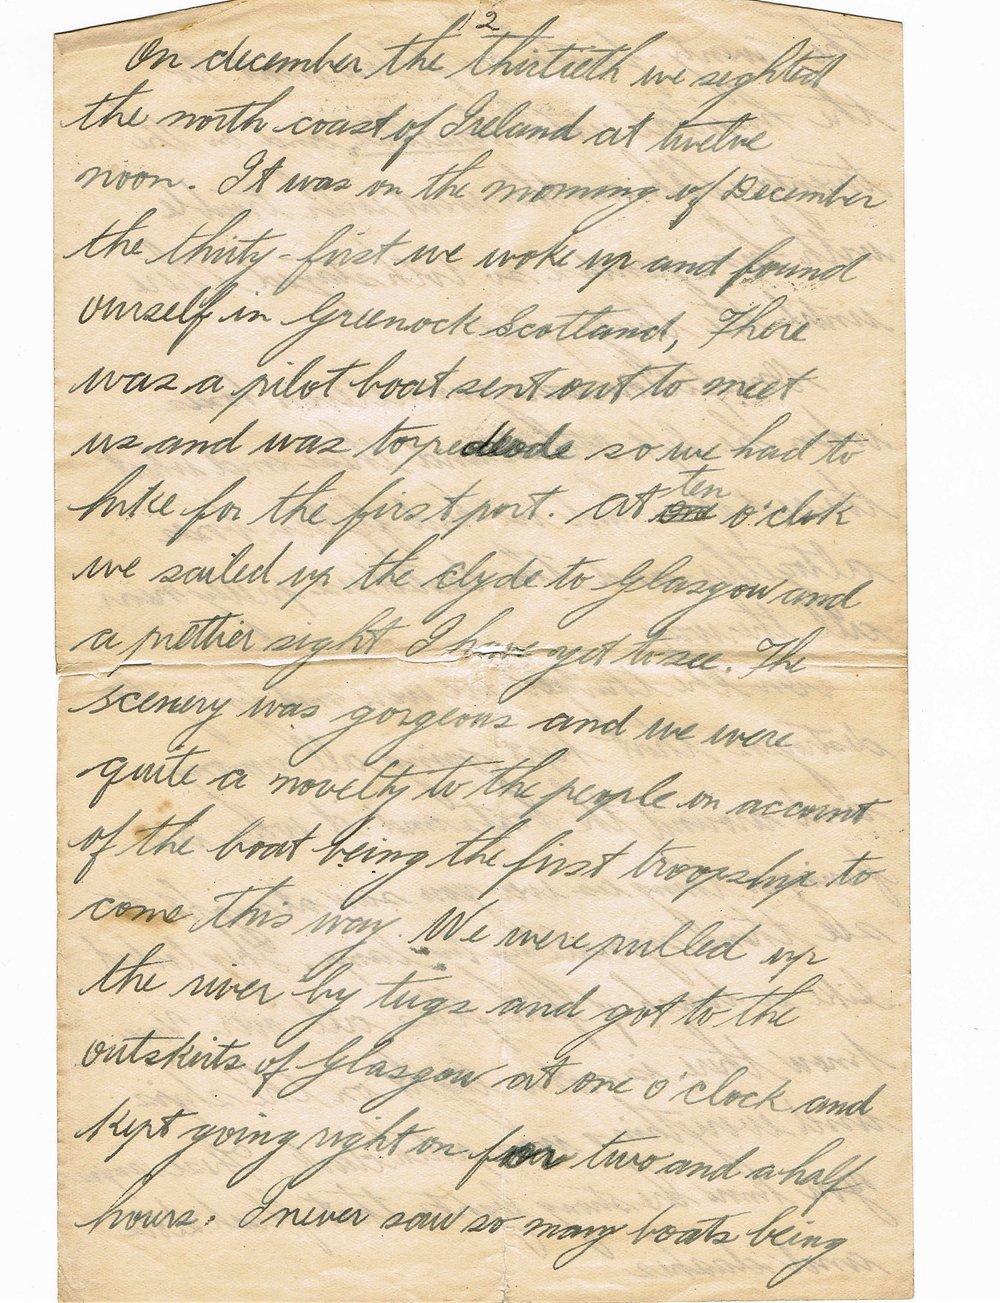 Basil Vale January 2, 1918 letter - page 12.jpg